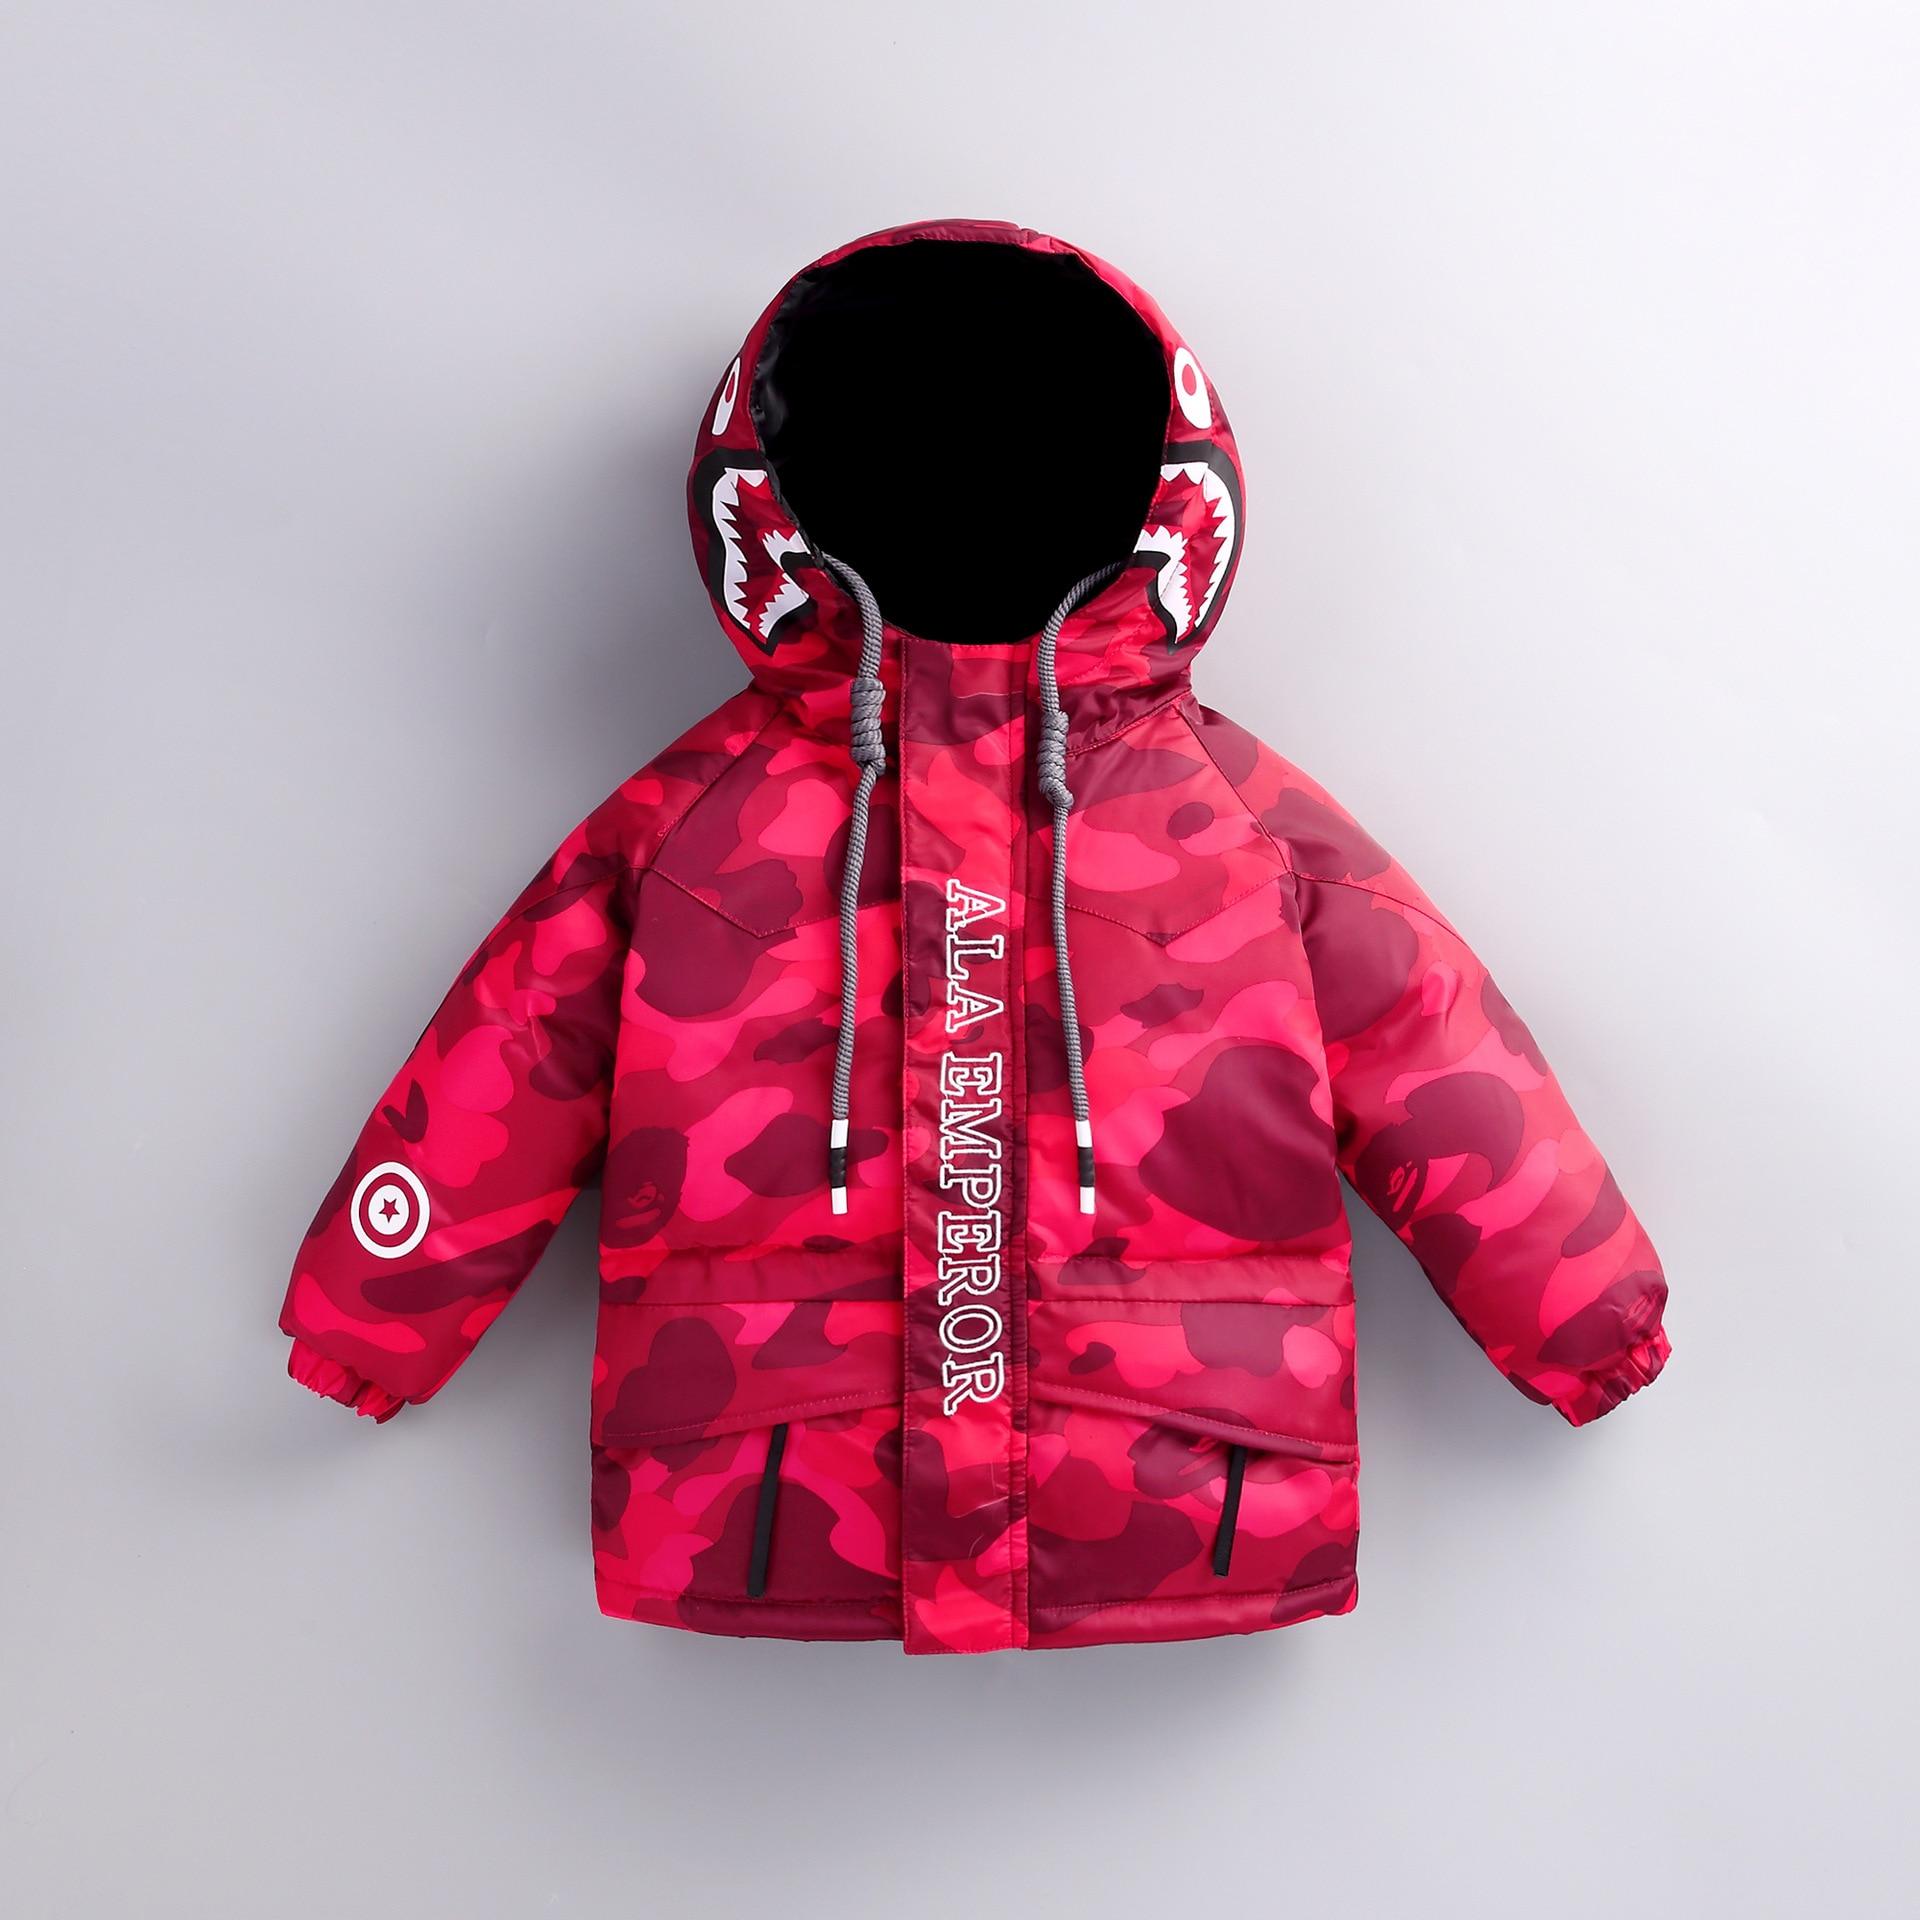 New style children winter jackets fashion Down & Parkas thicken boys warm snowsuit hooded girls winter clothing down kids coats стоимость